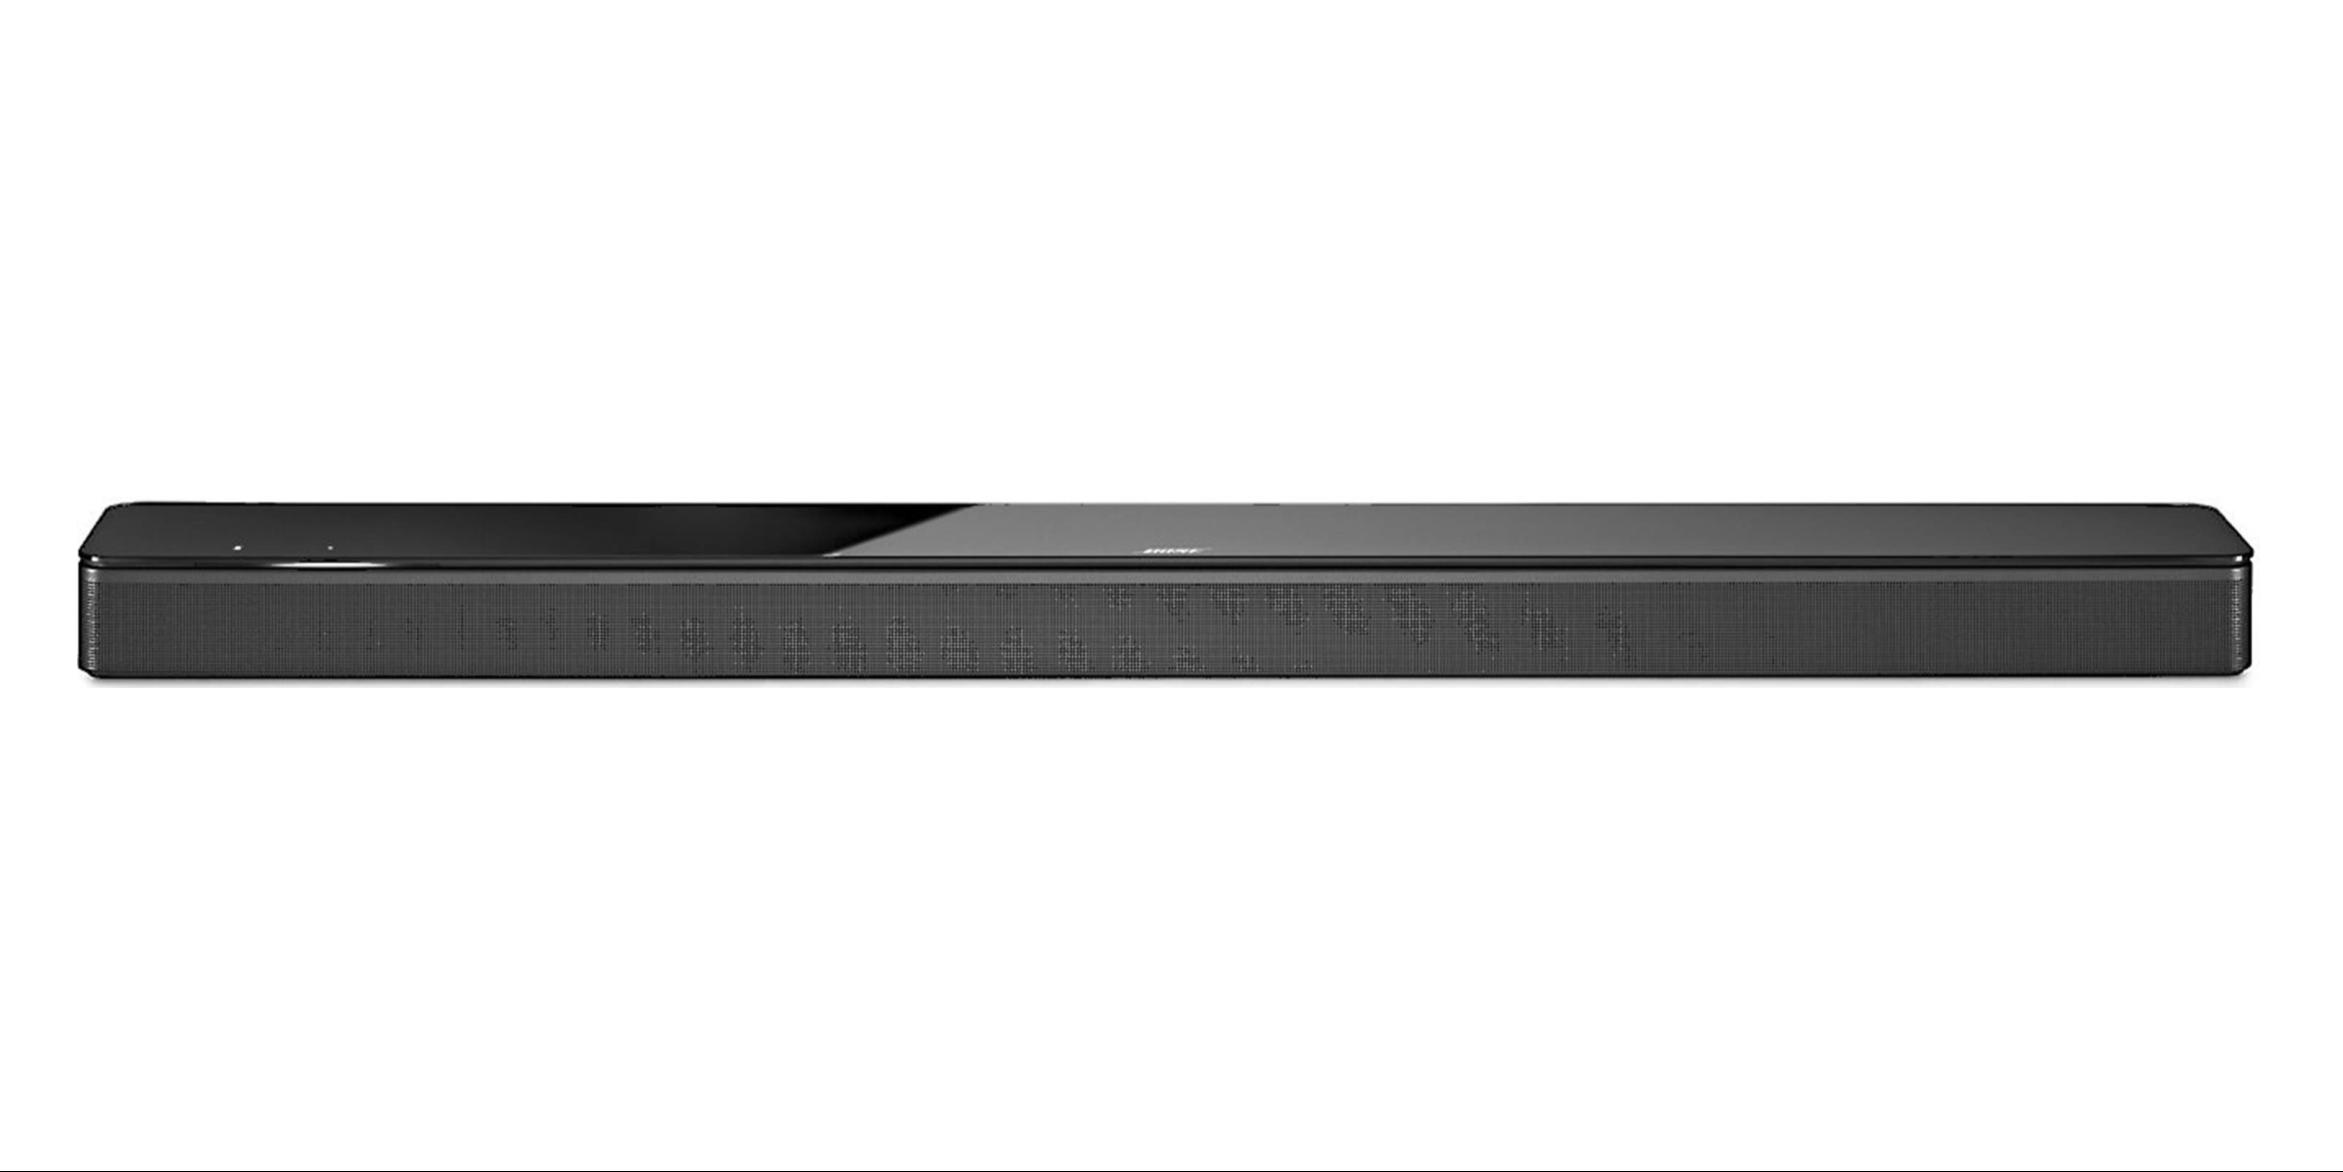 Bose Soundbar 700 Alexa Enabled Smart Soundbar